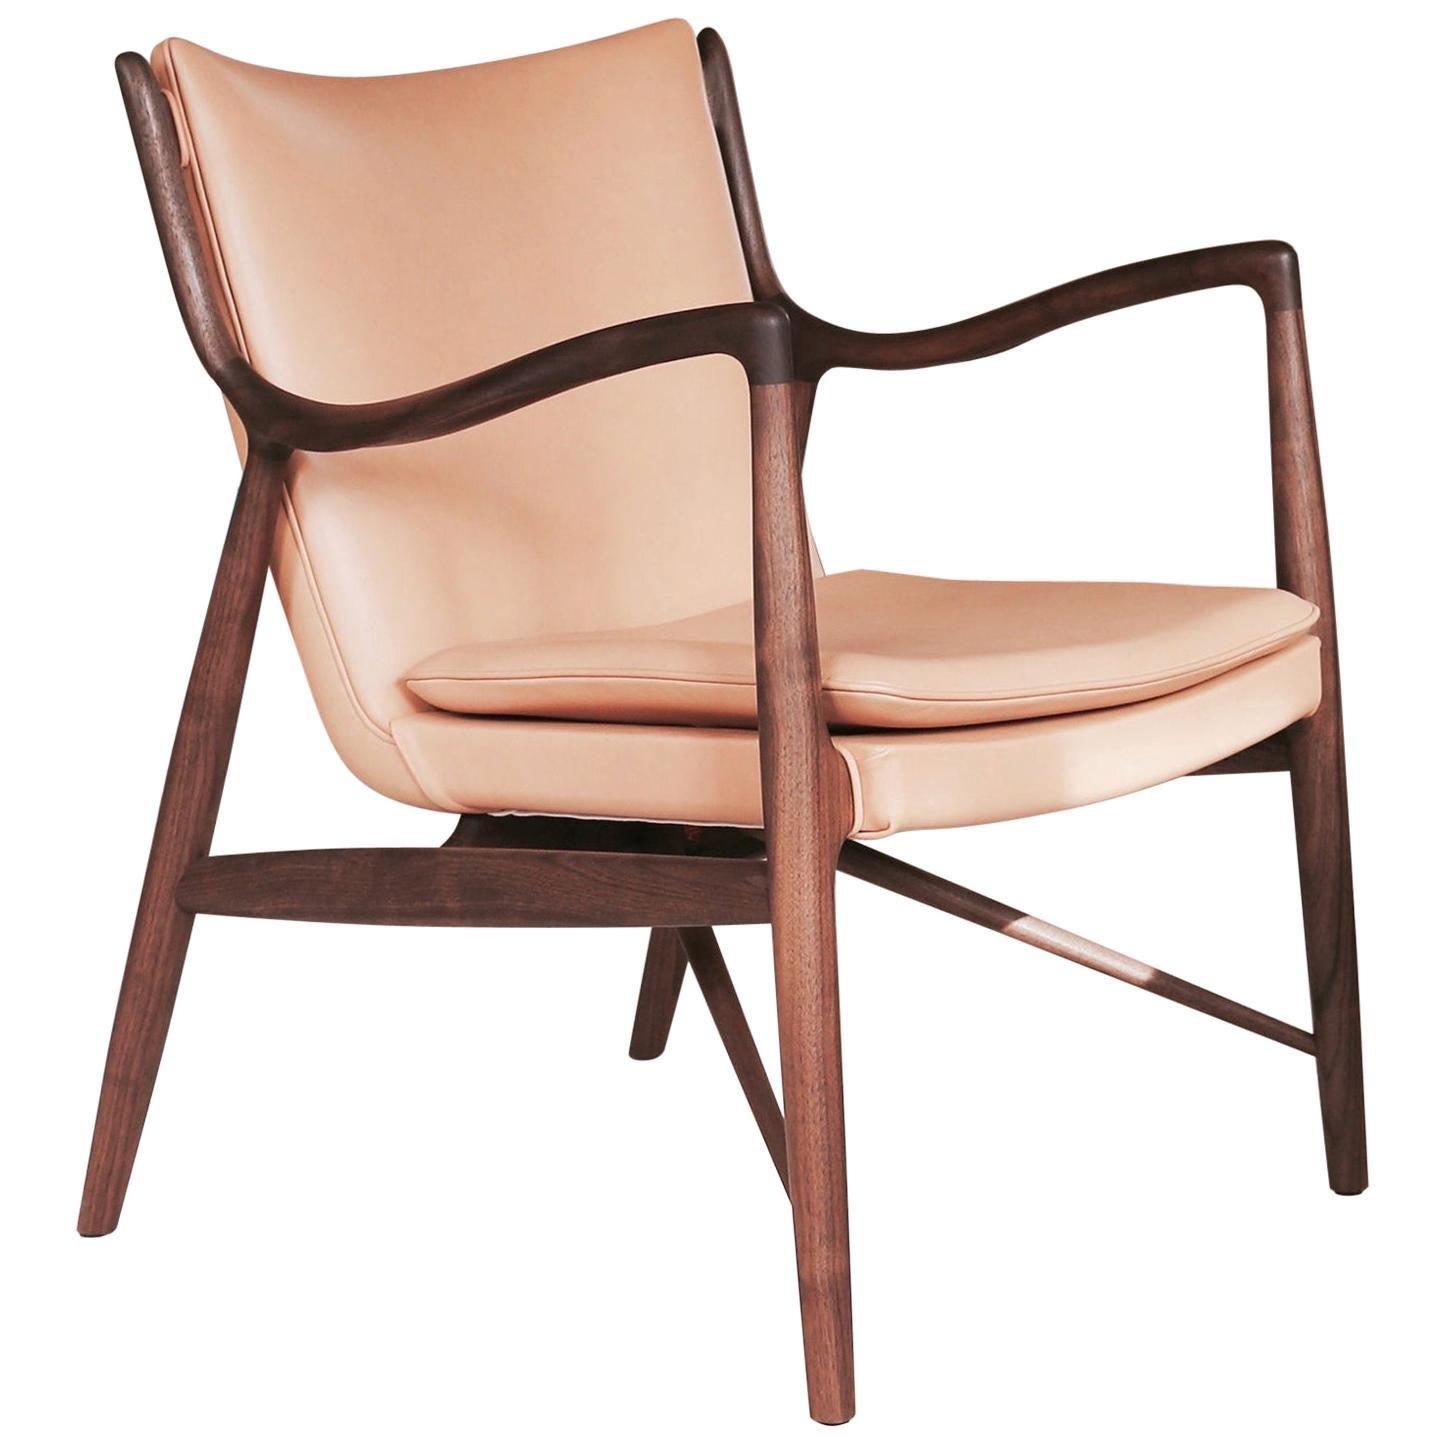 Finn Juhl 45 Chair Wood and Leather by House of Finn Juhl